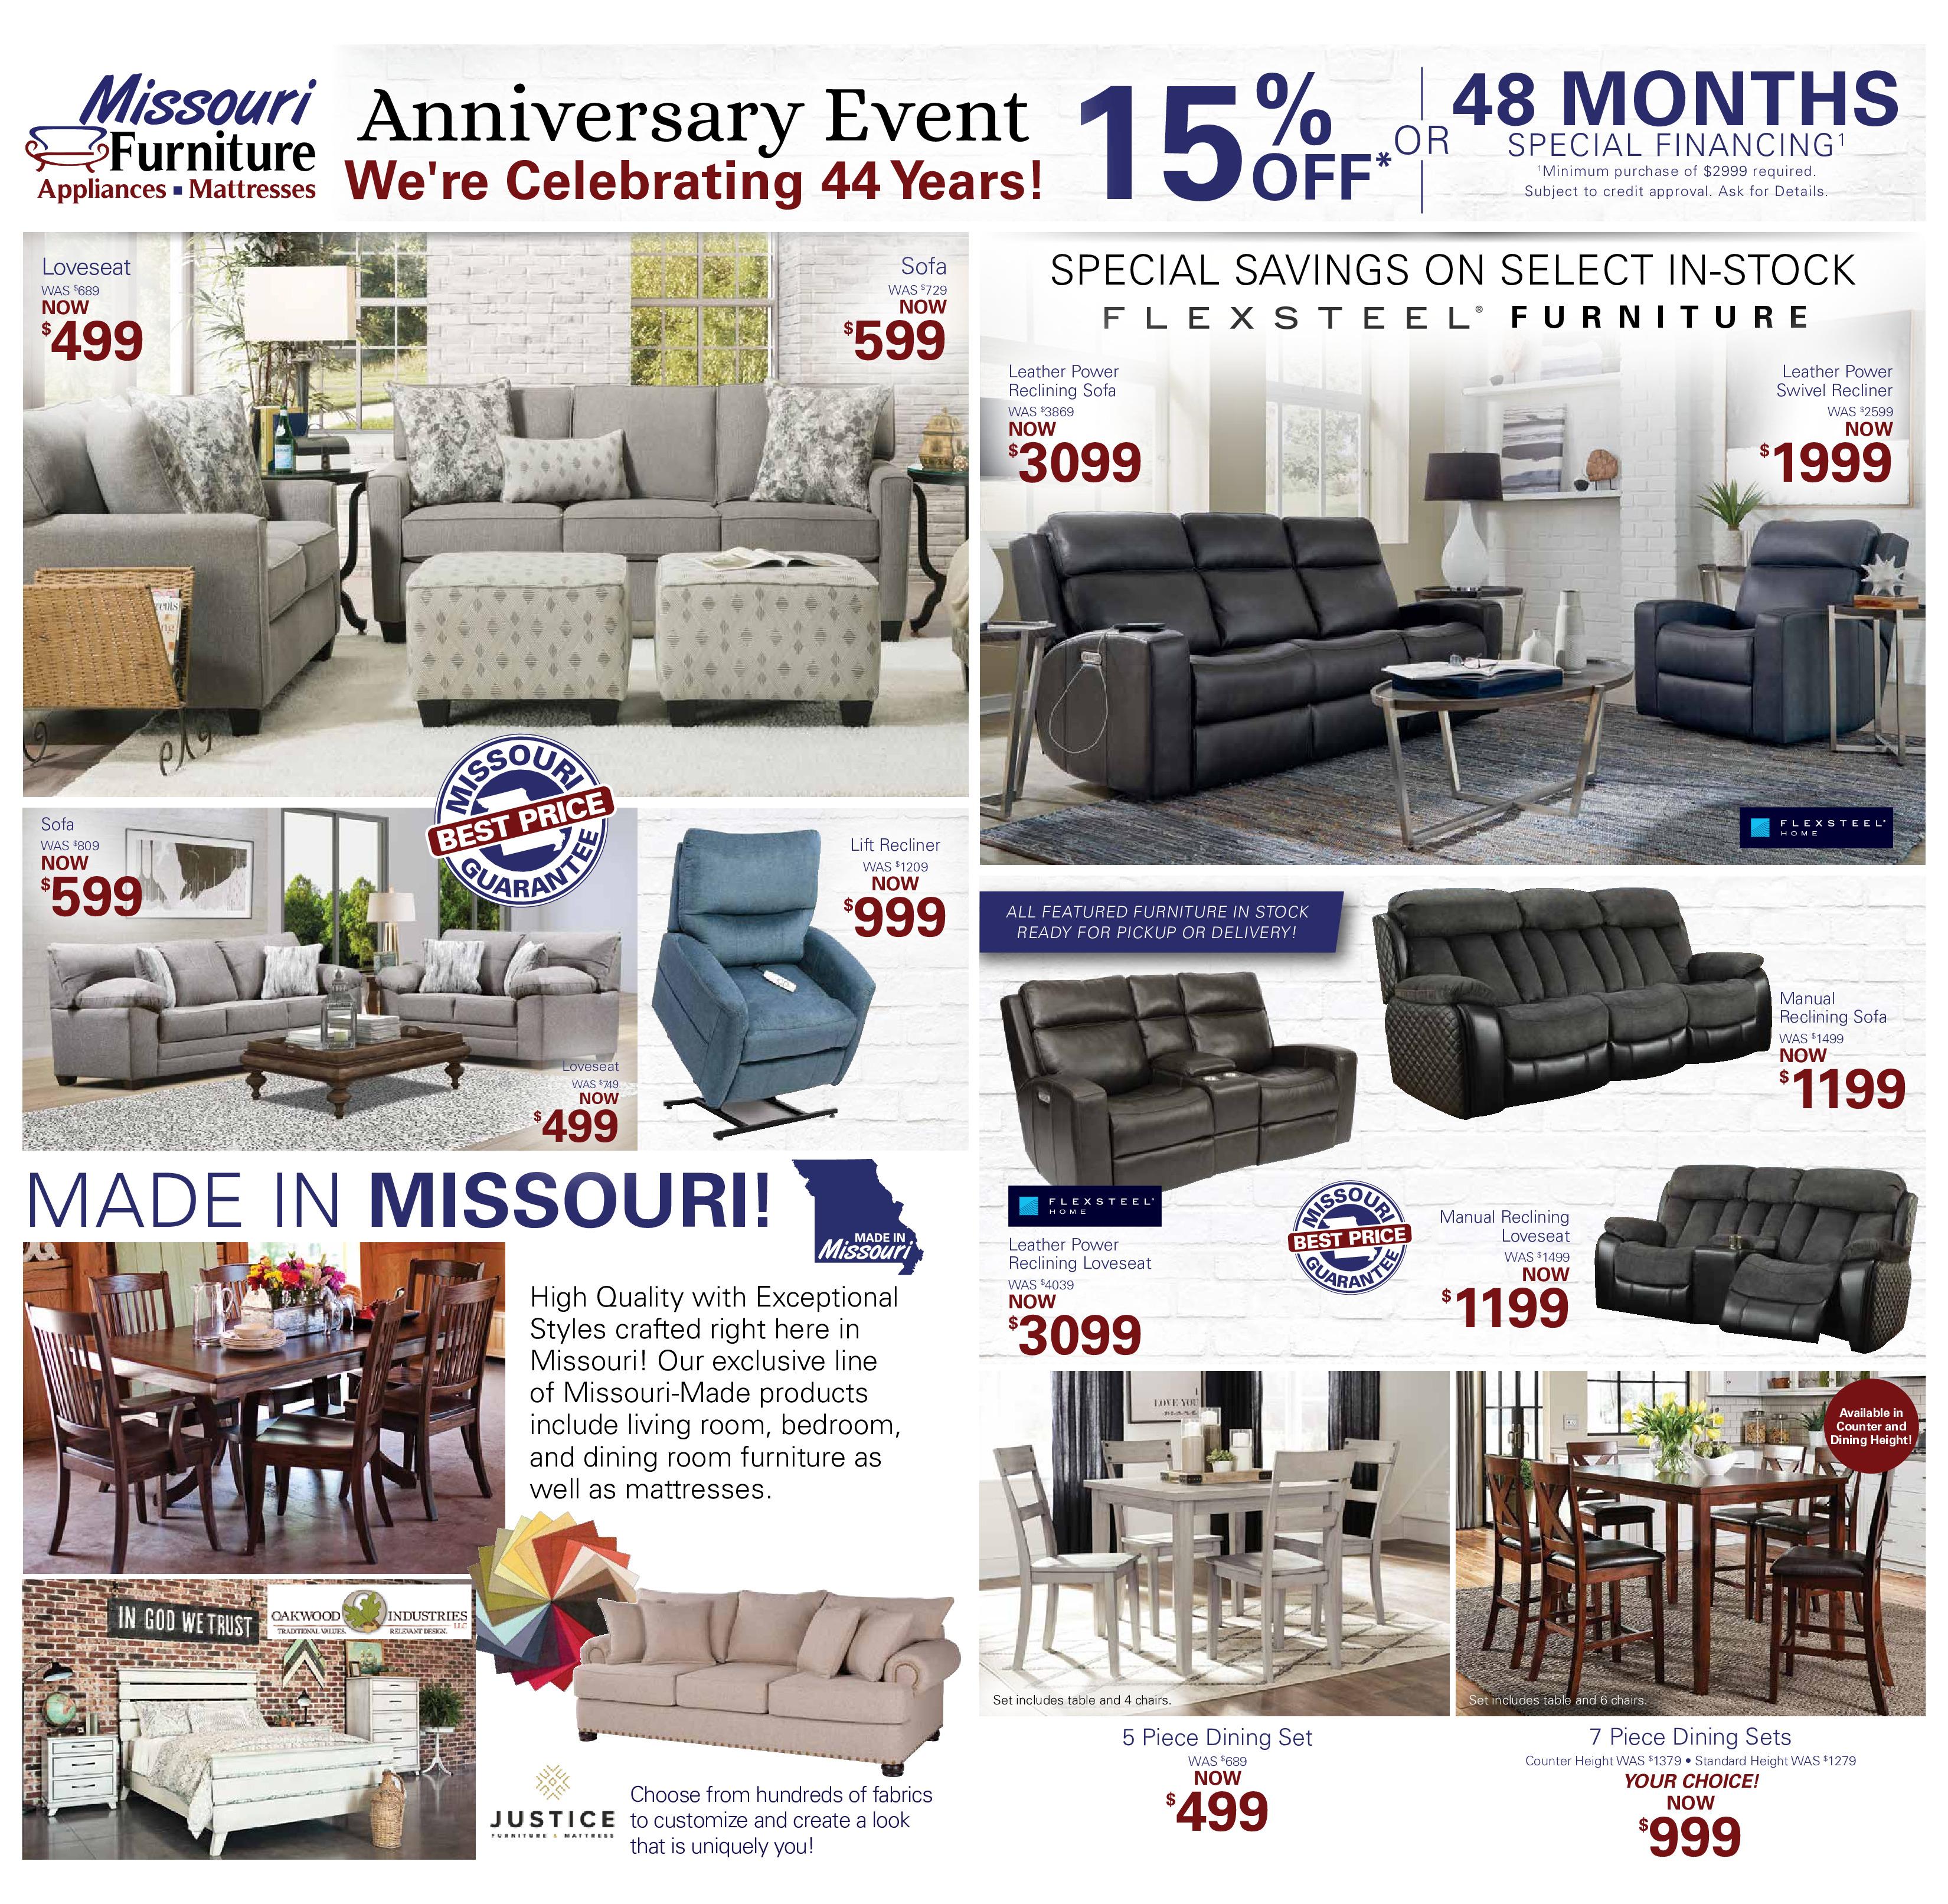 MISS-9021-21101-AnniversarySale-WebSpcl